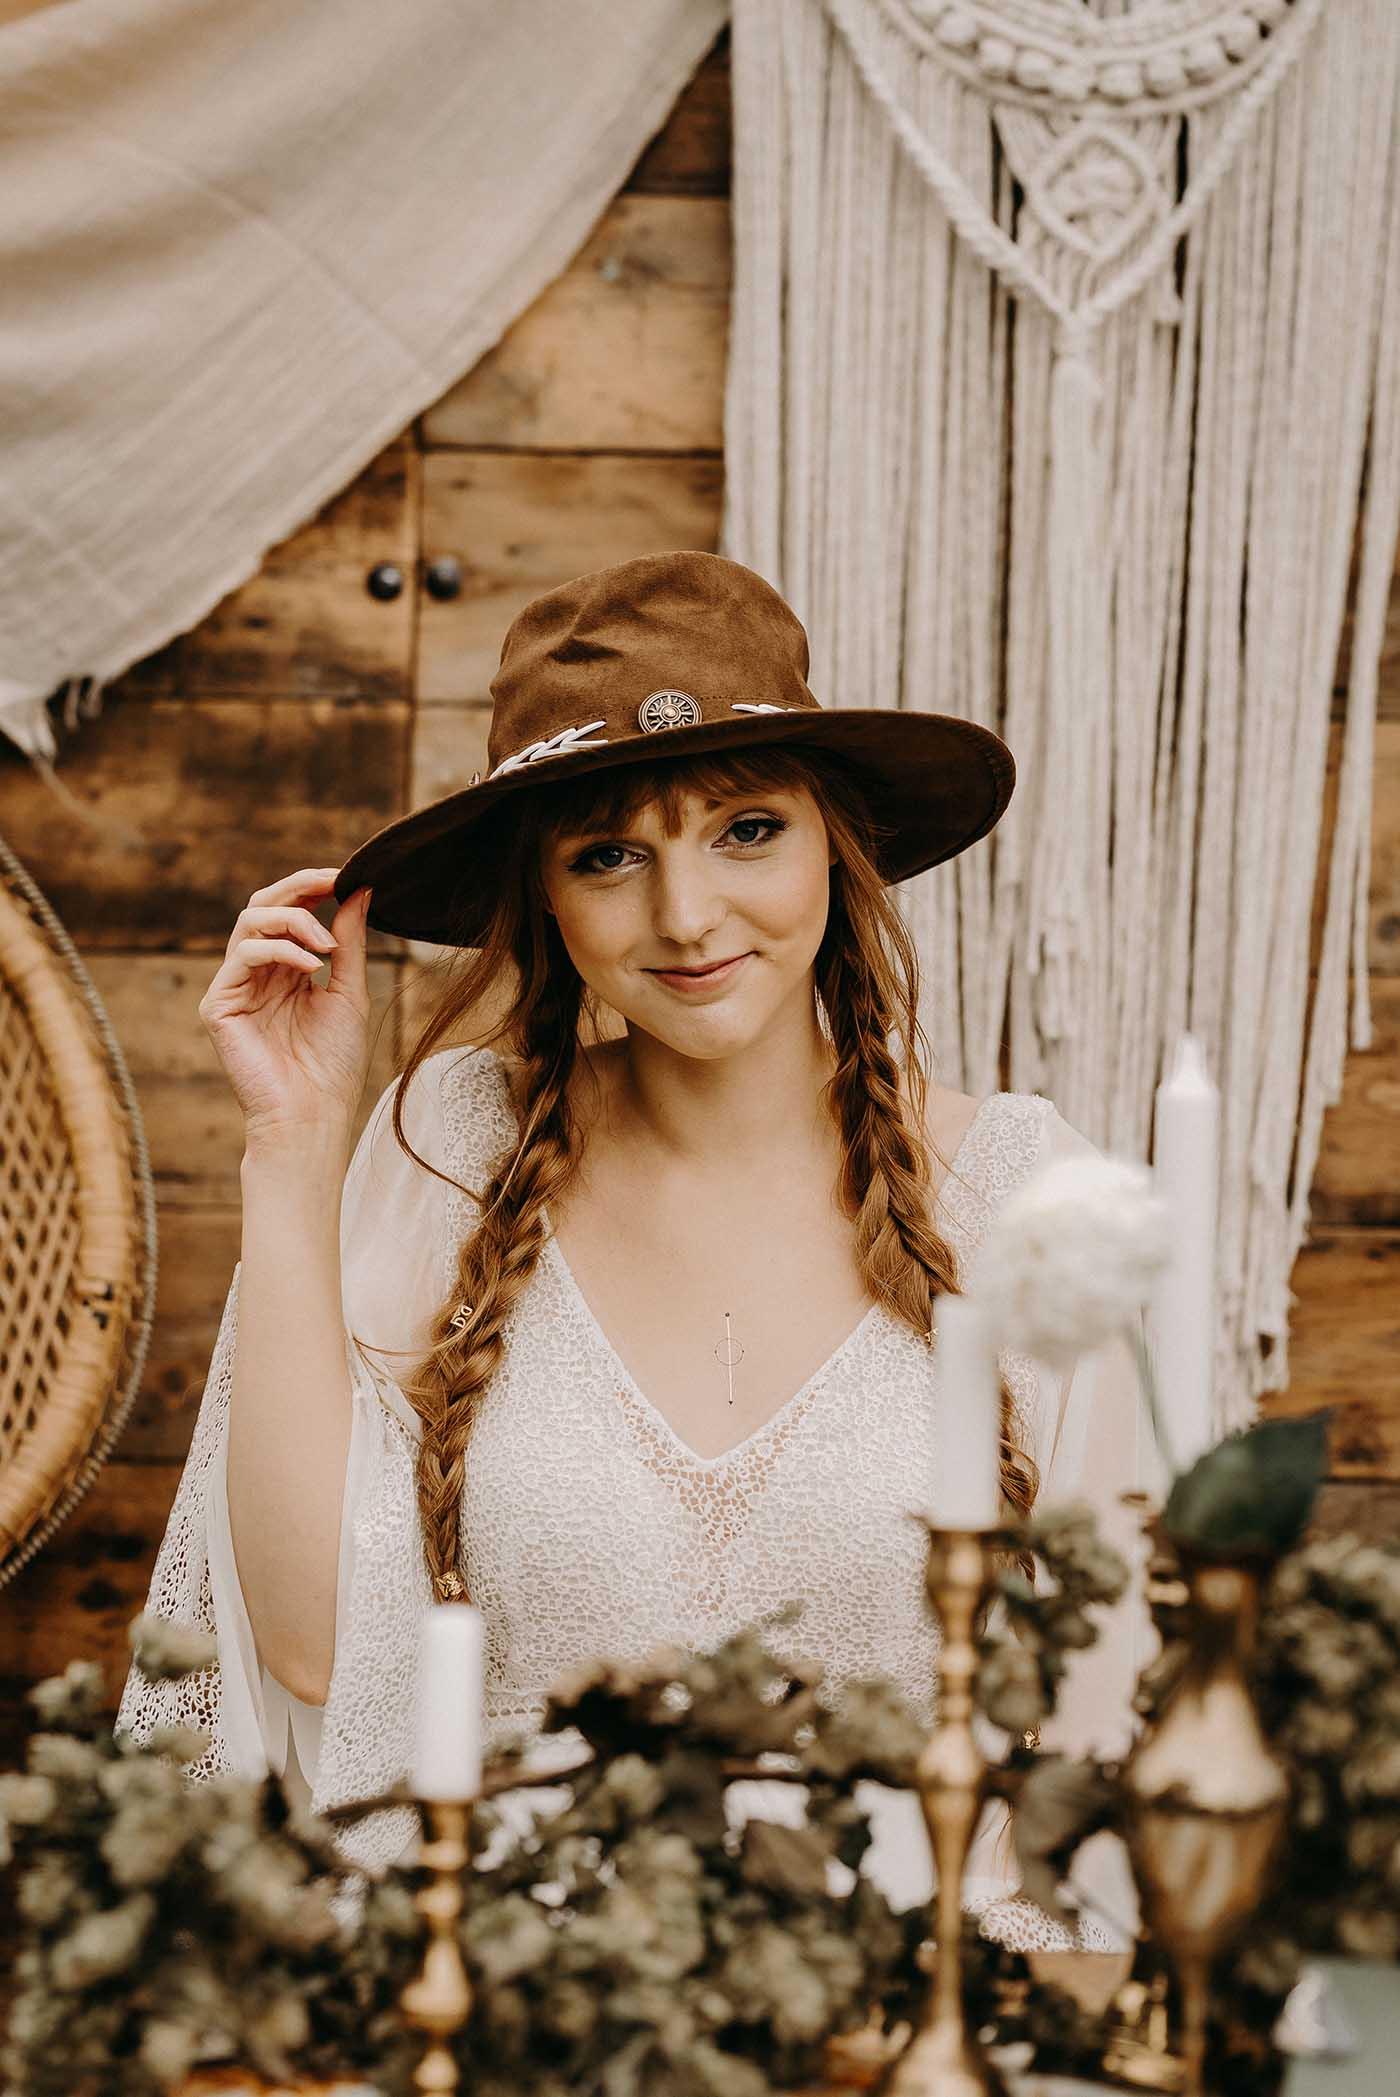 767f3d62e Boho Bride in Lace Dress & Hat | Drapes, Dried Flowers & Macrame Decor